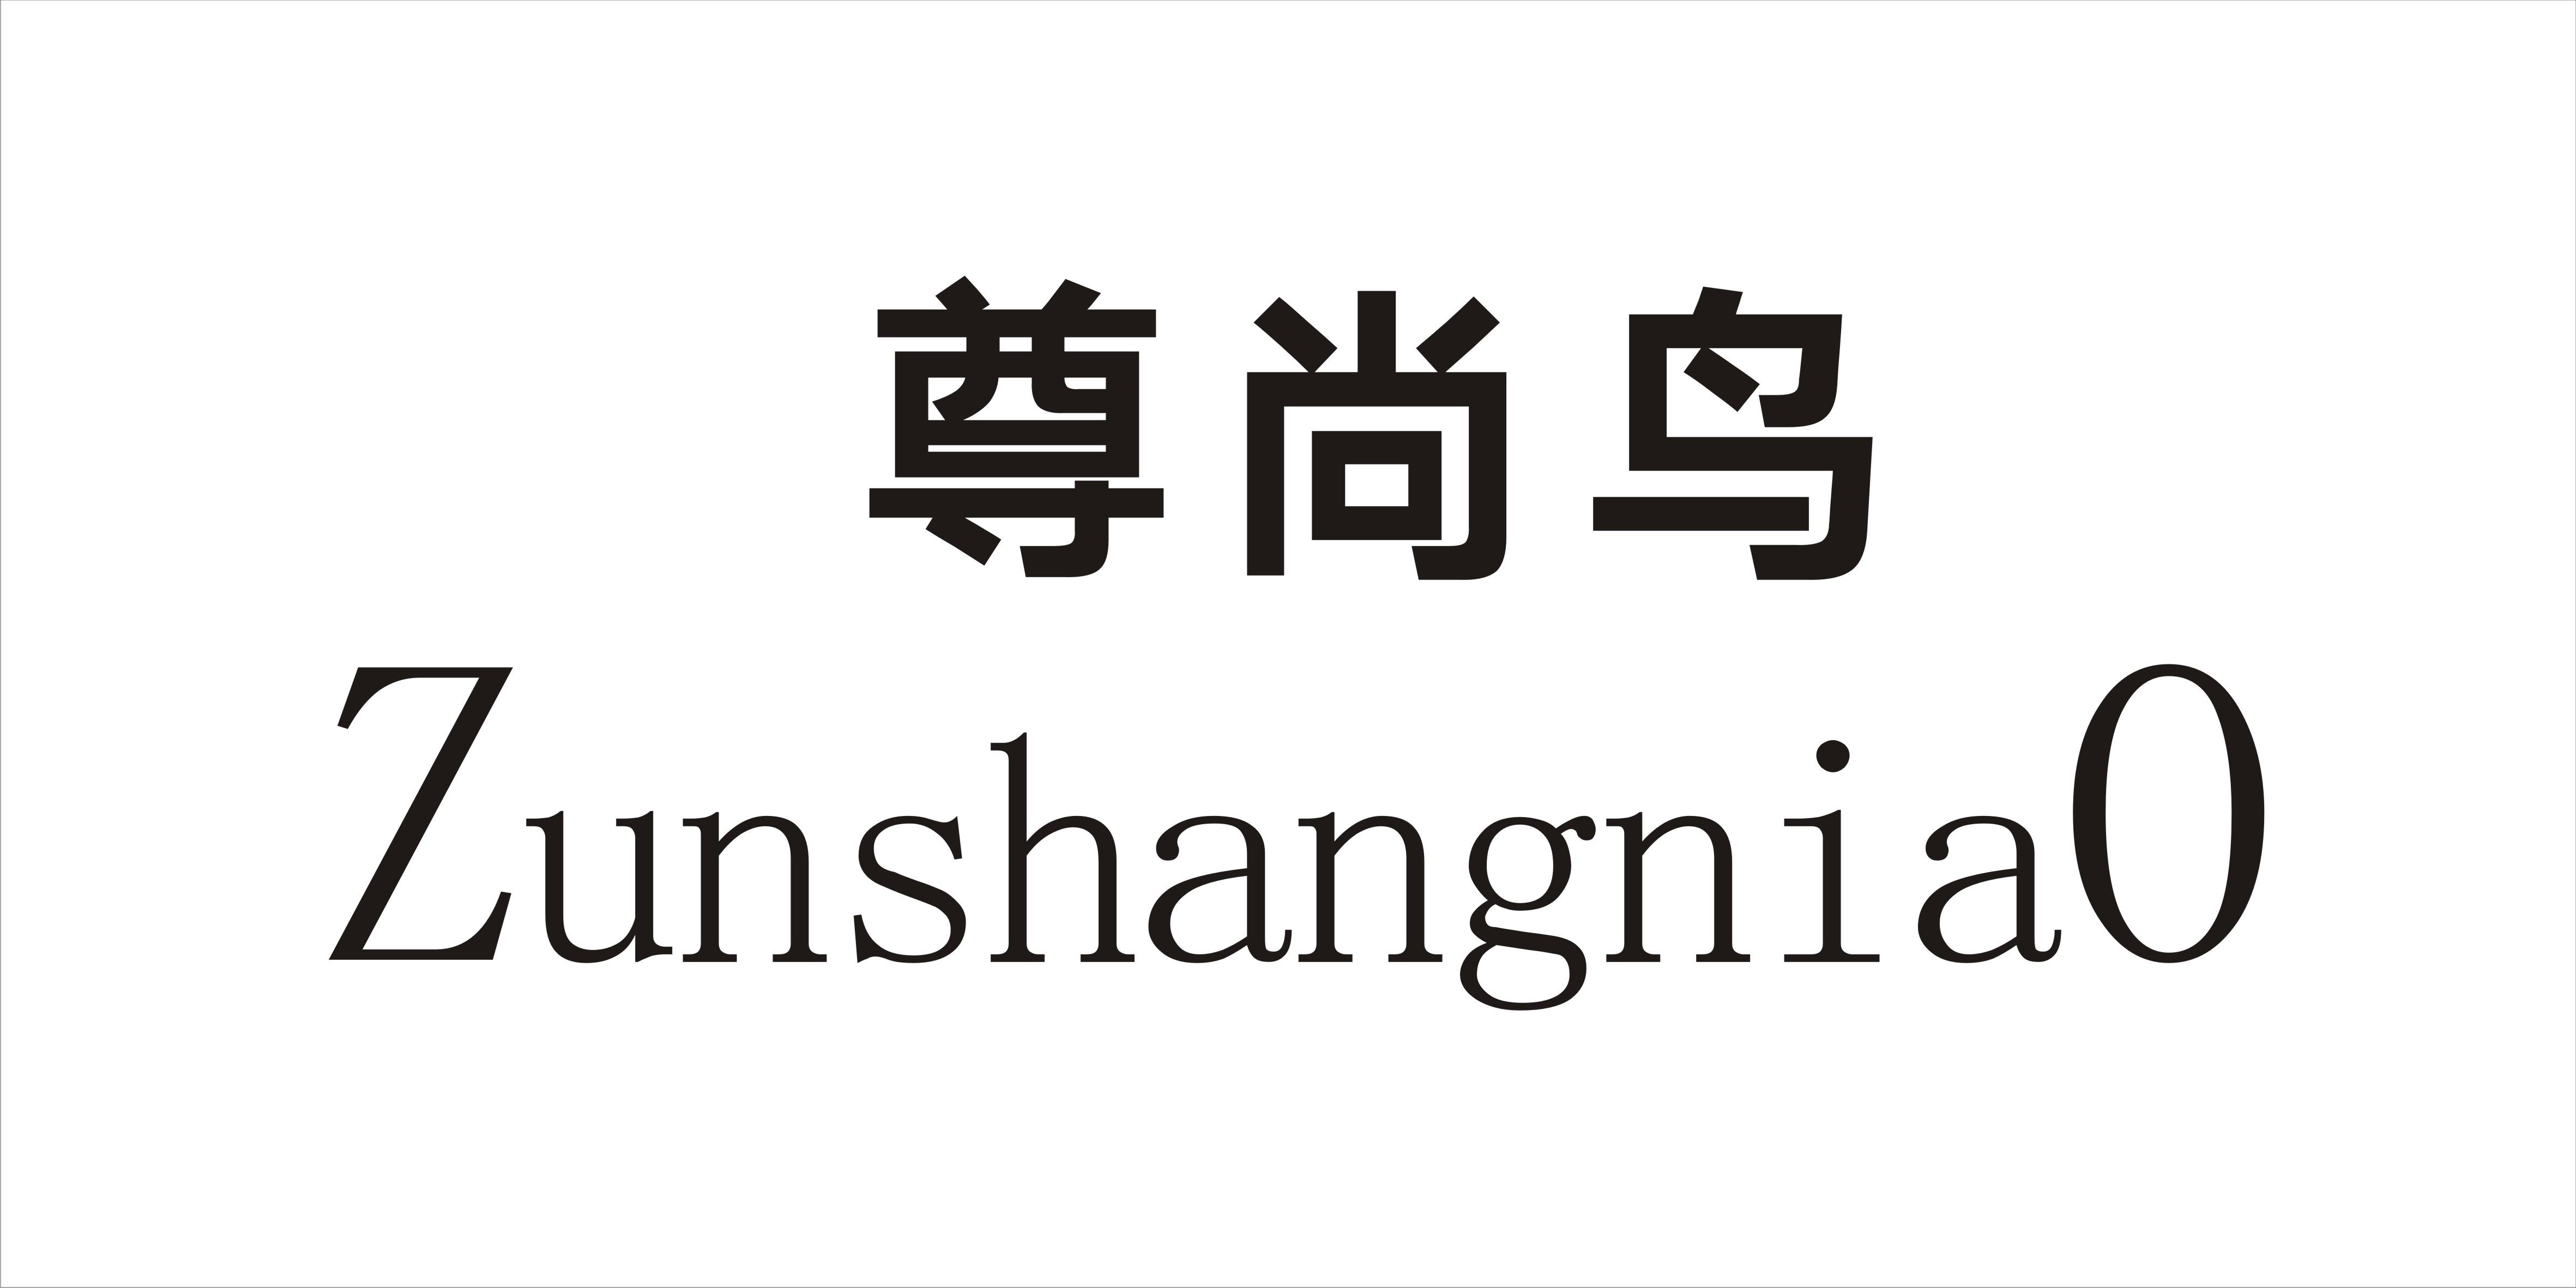 尊尚鸟(ZunshangniaO)